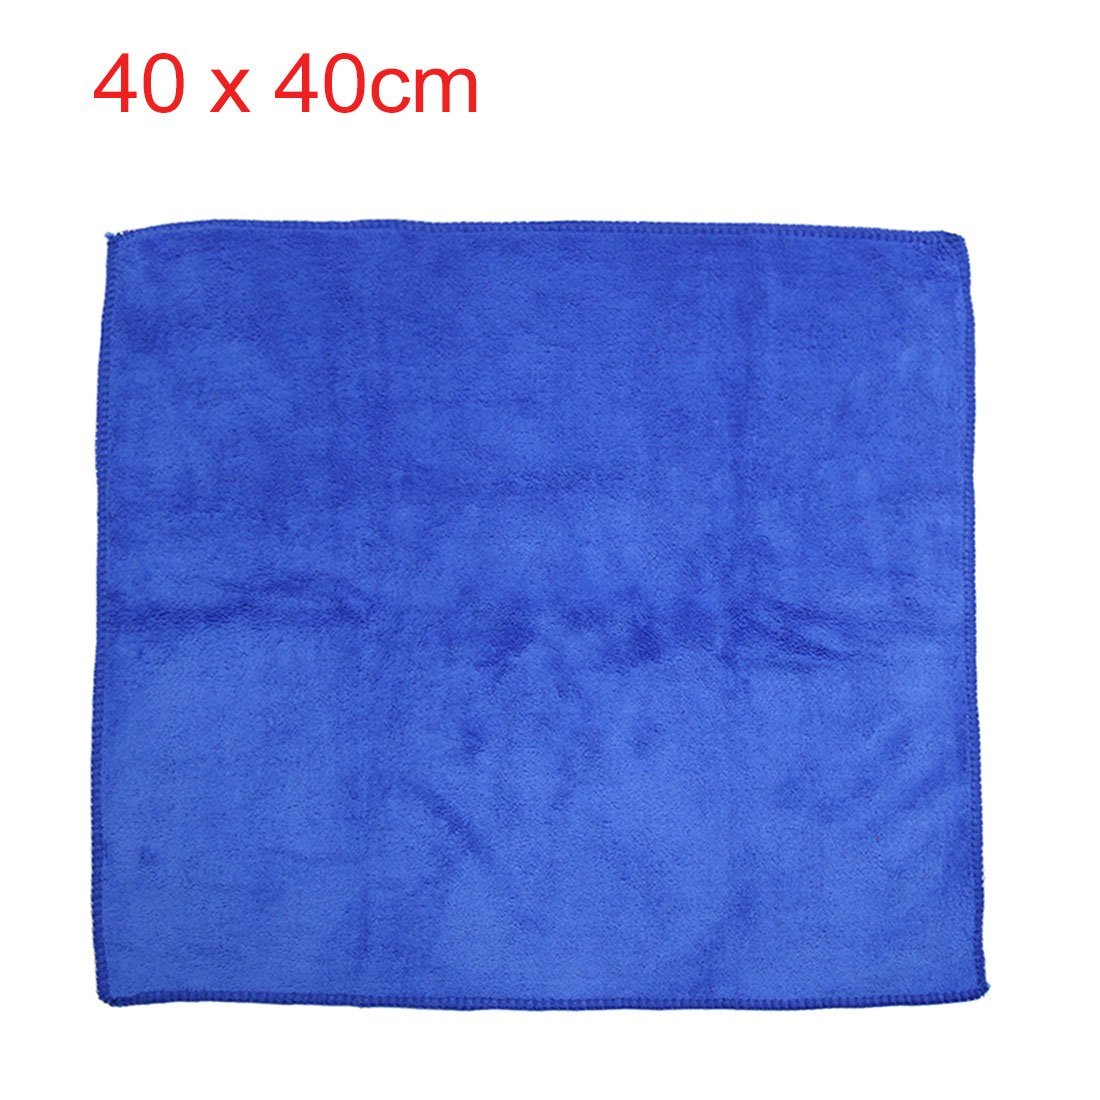 Amazon.com: eDealMax 2pcs 40 x 40 cm de limpieza de microfibra de coches 400gsm secar las toallas de Tela Lavada Azul Rojo: Automotive